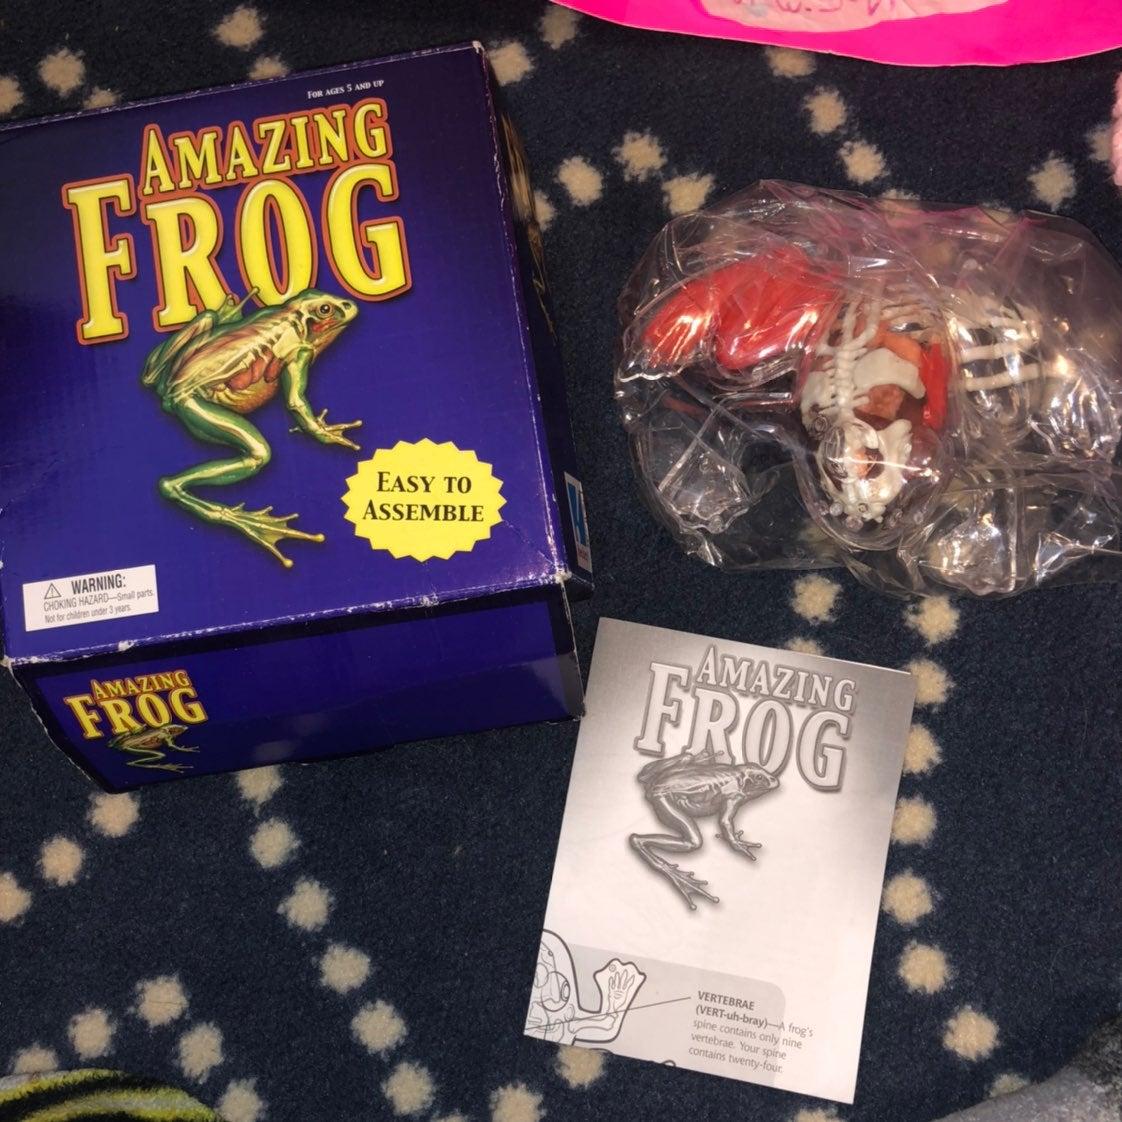 Amazing frog (fake Dissection frog)